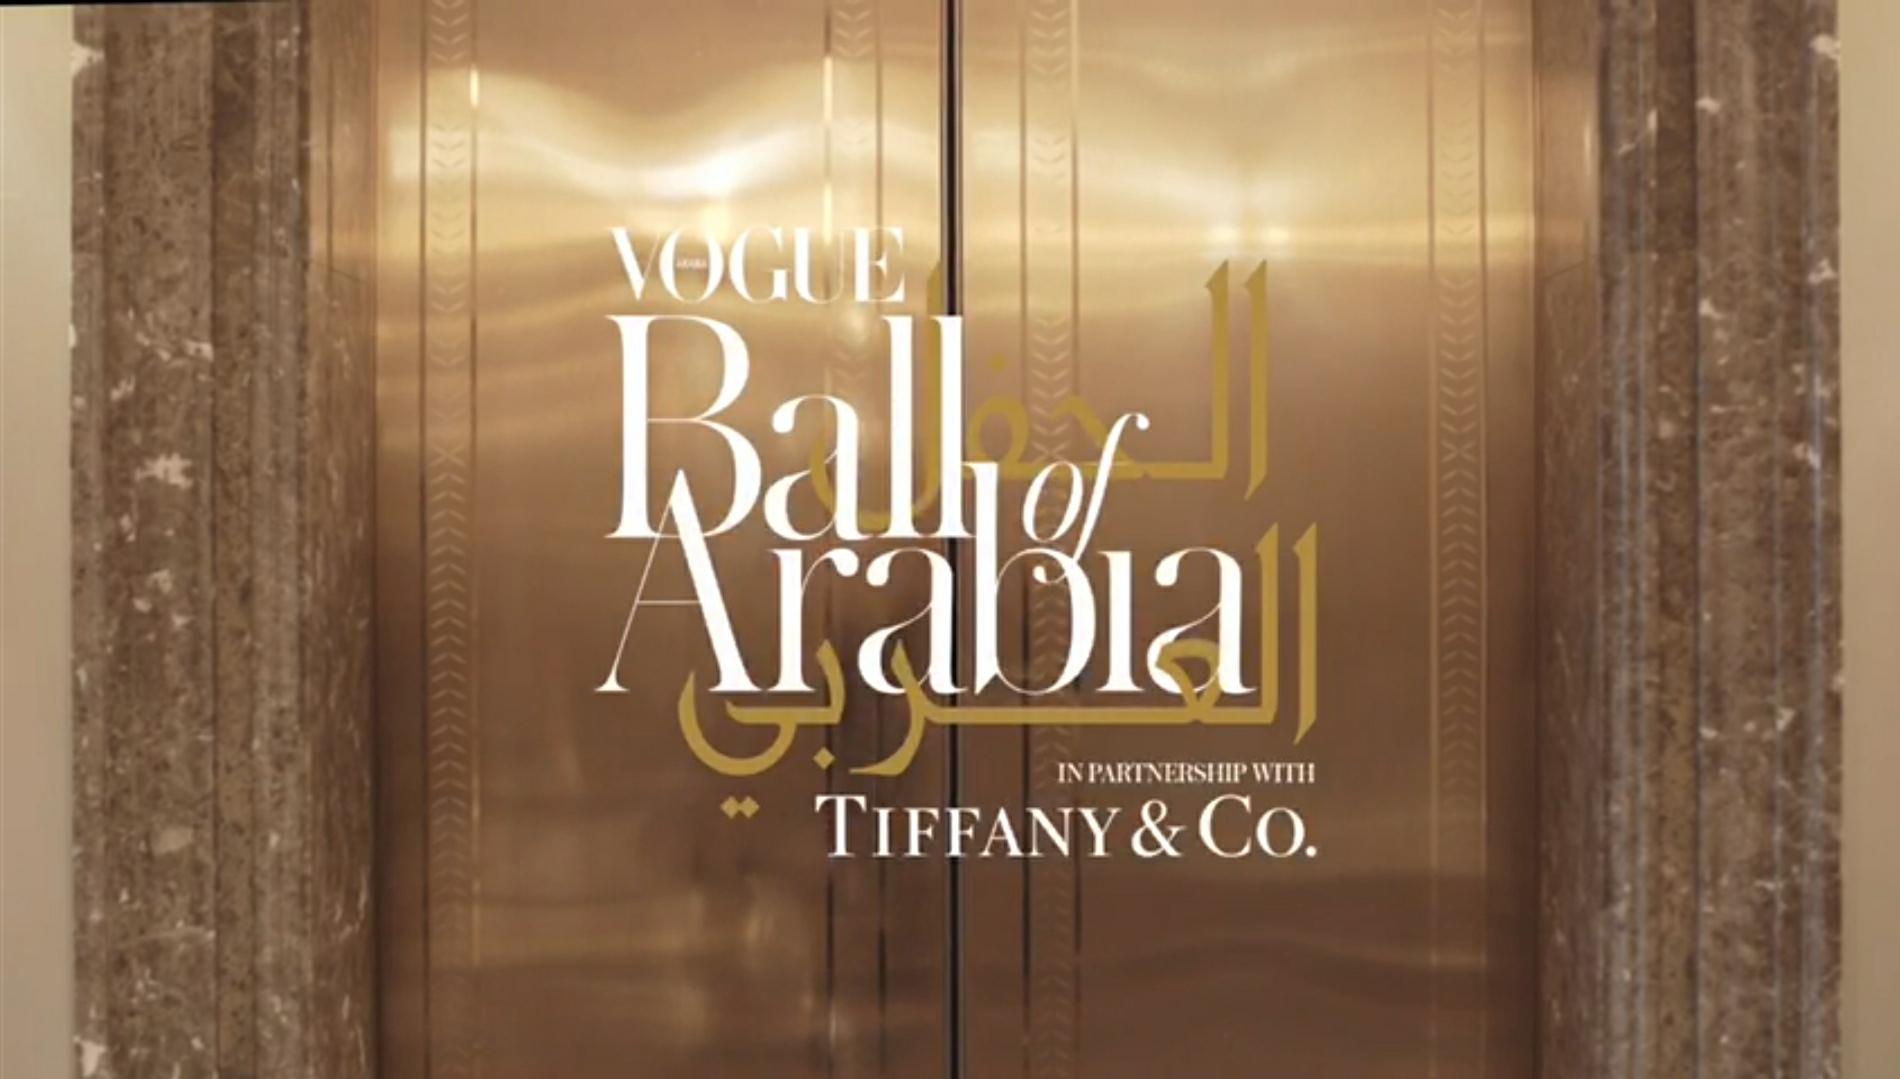 Ball of Arabia - Vogue Arabia and Tiffany & Co.